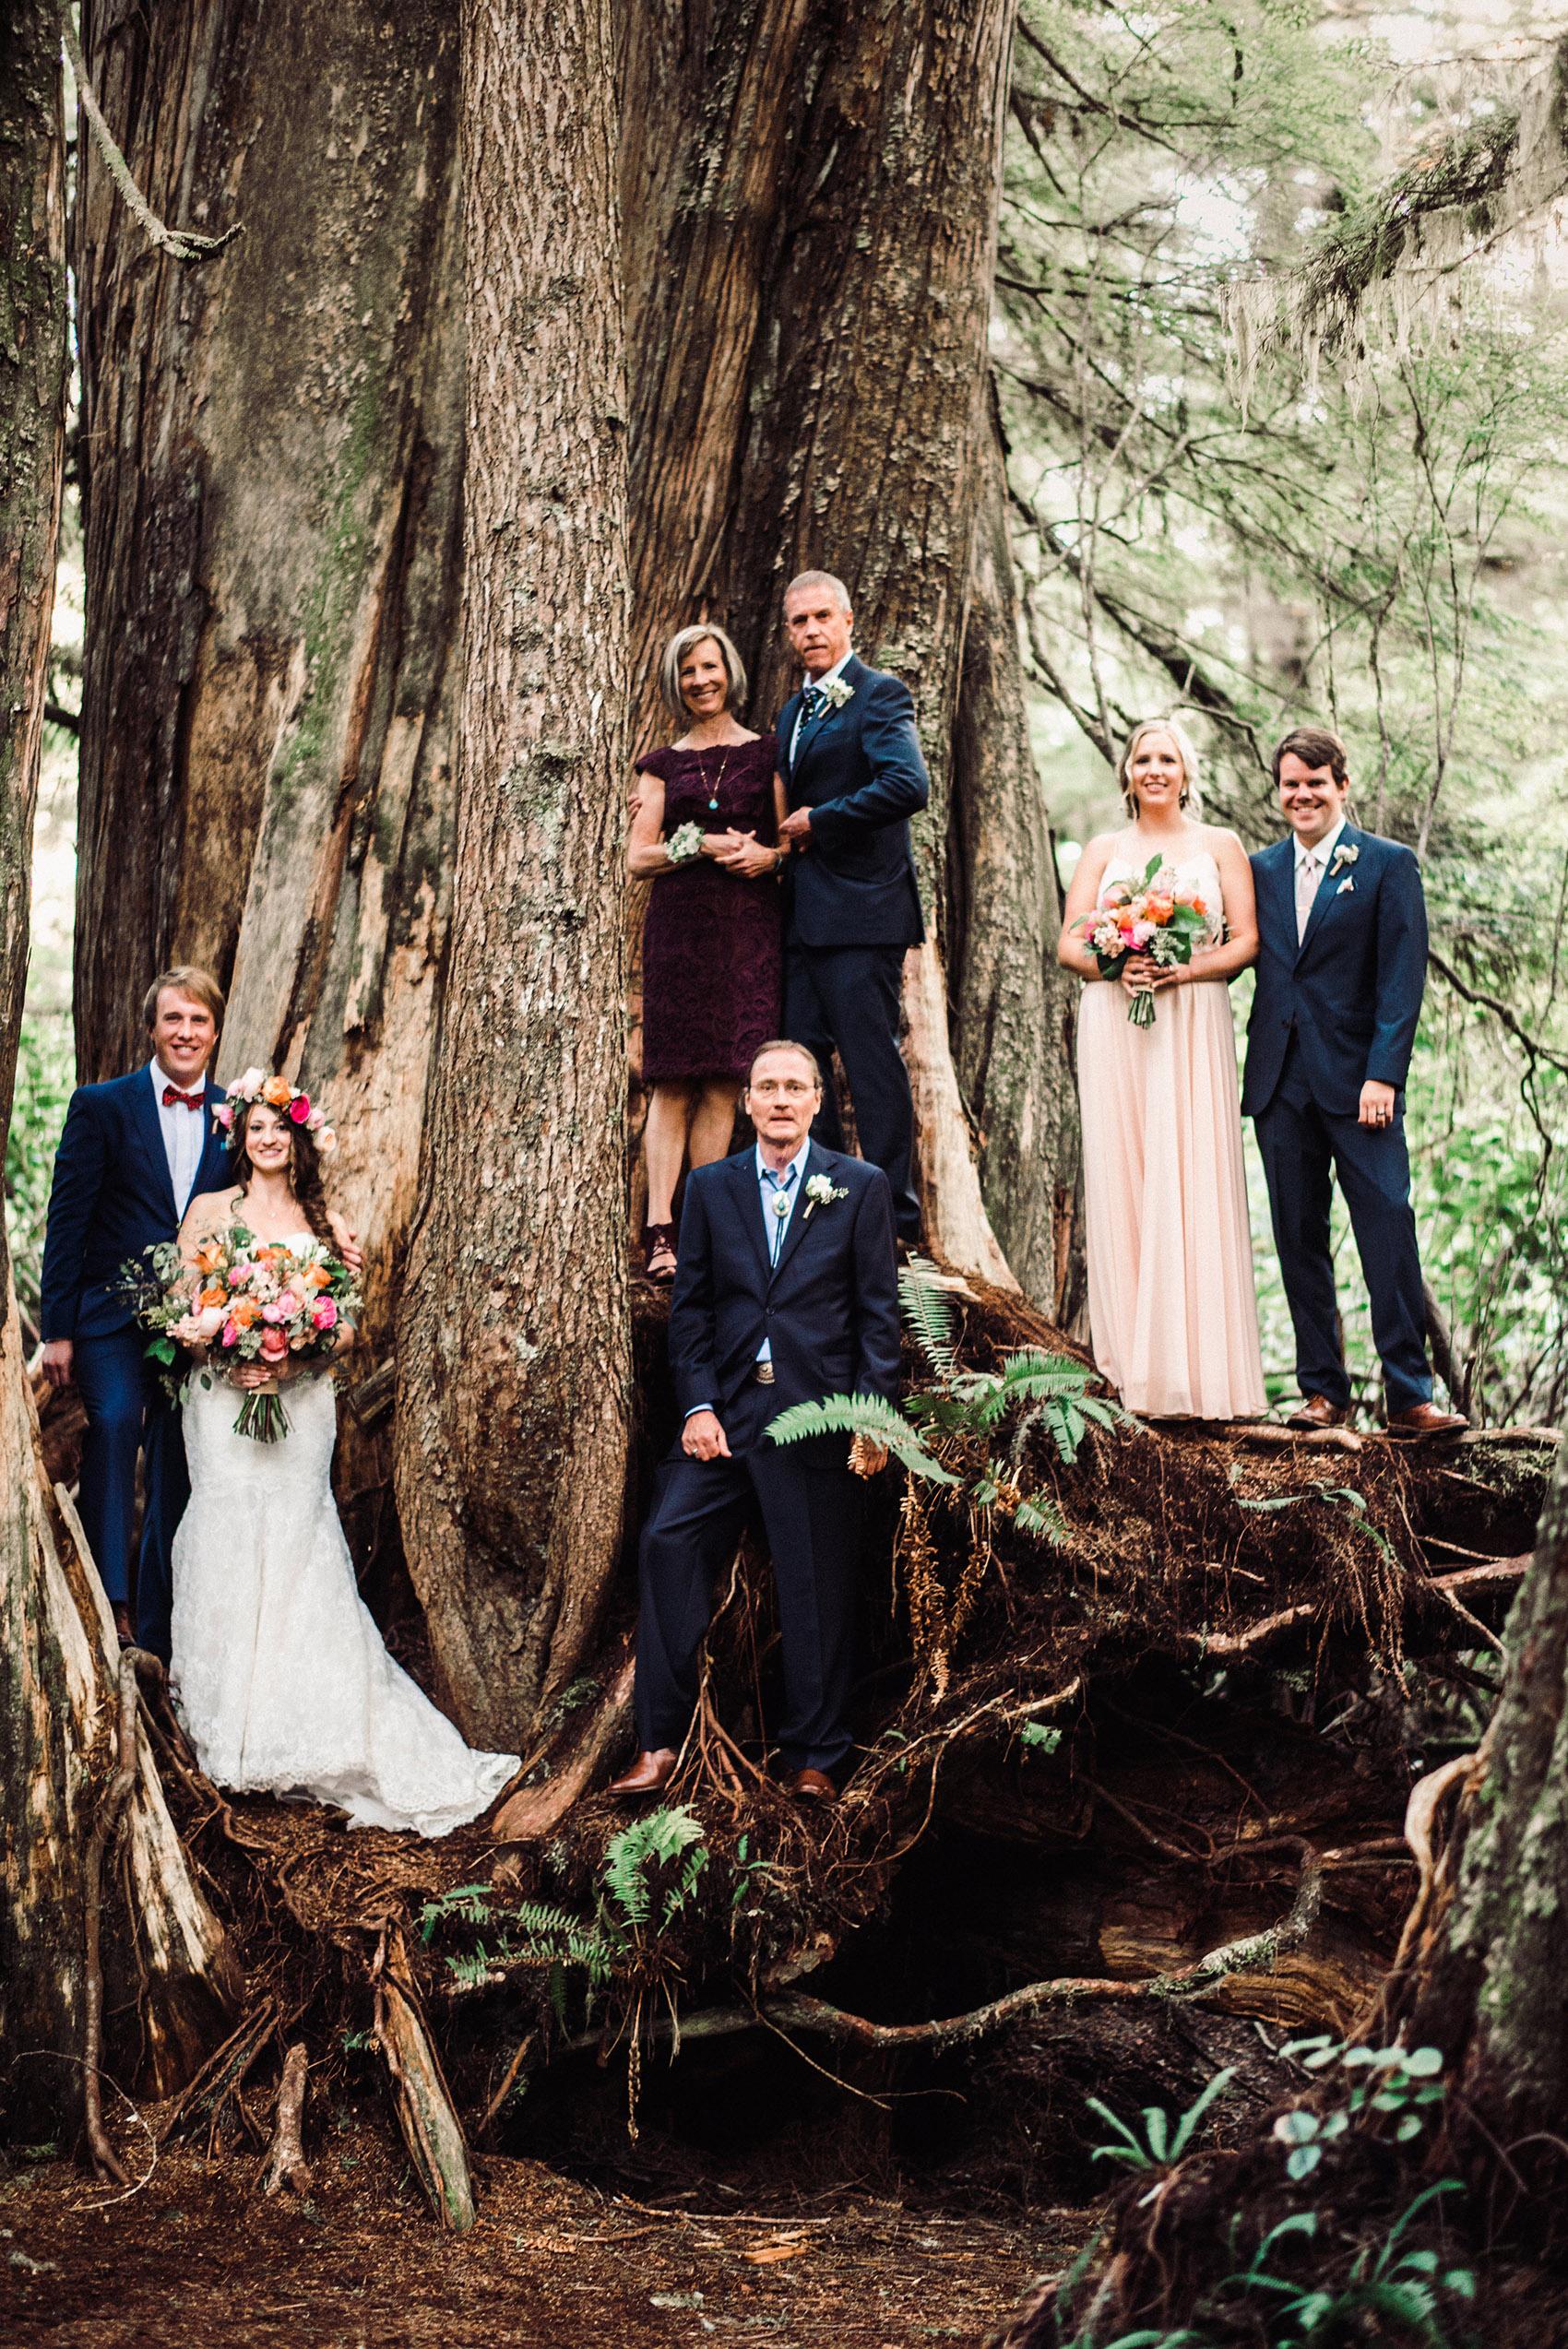 Tofino-BC-wedding-wickaninnish-inn-ryan-flynn-photography-bethsam-family-0004.JPG